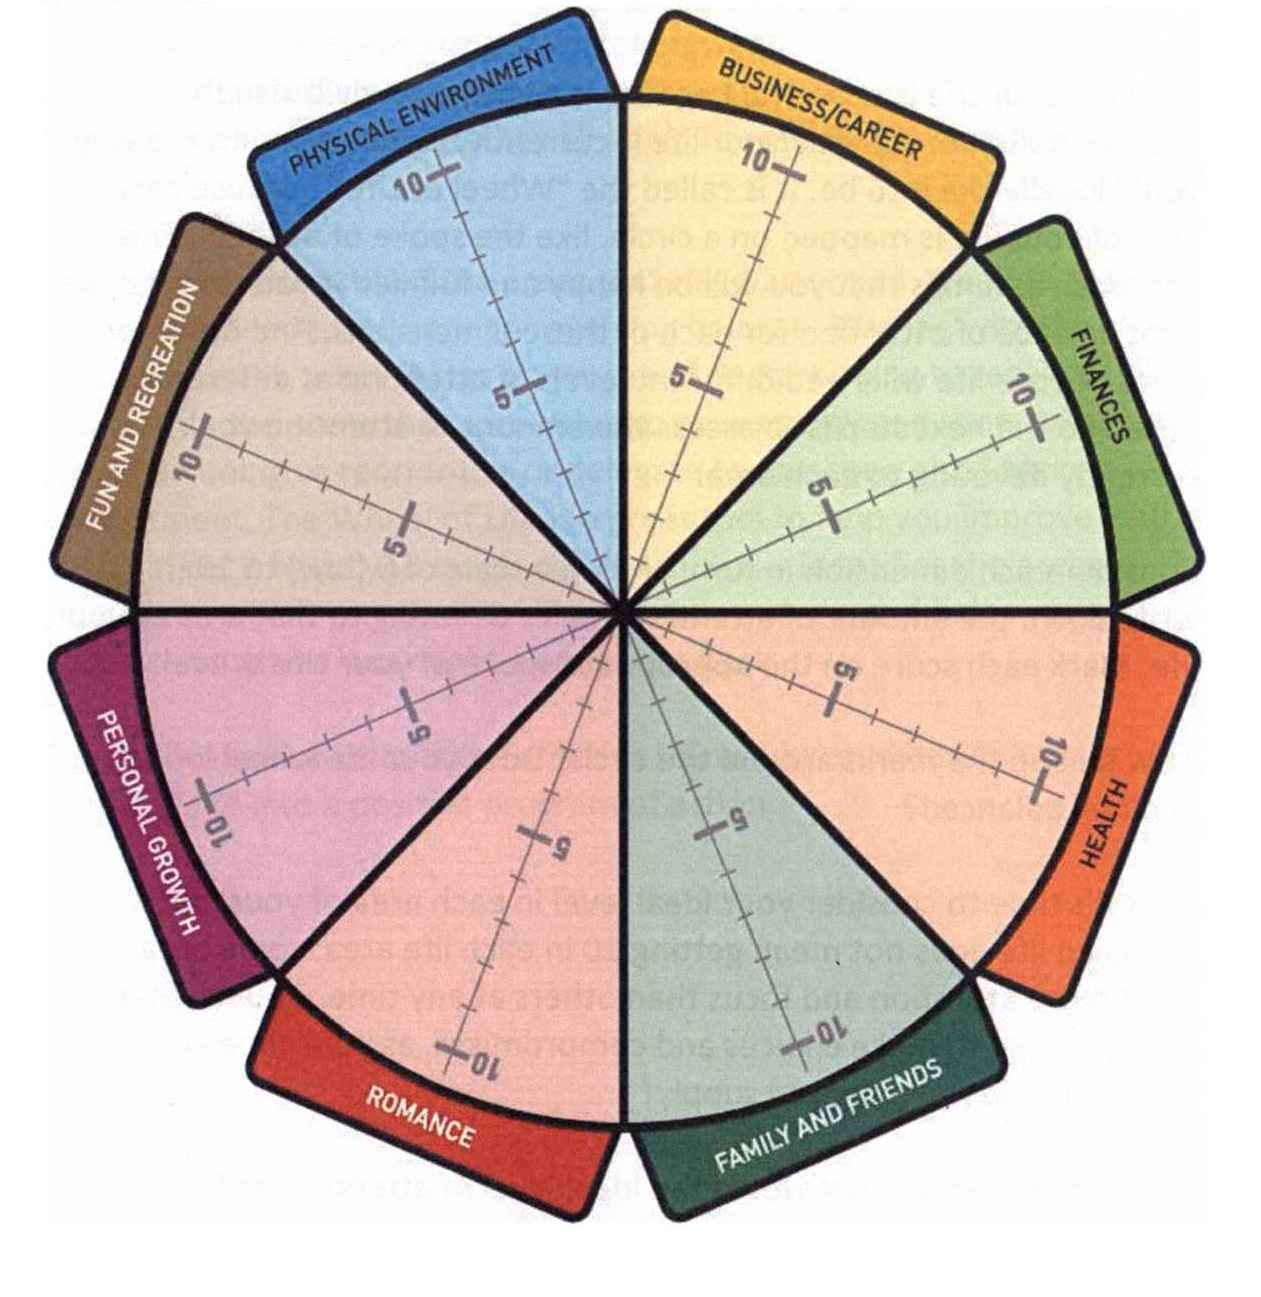 buddhist wheel of life template - columbus coaching